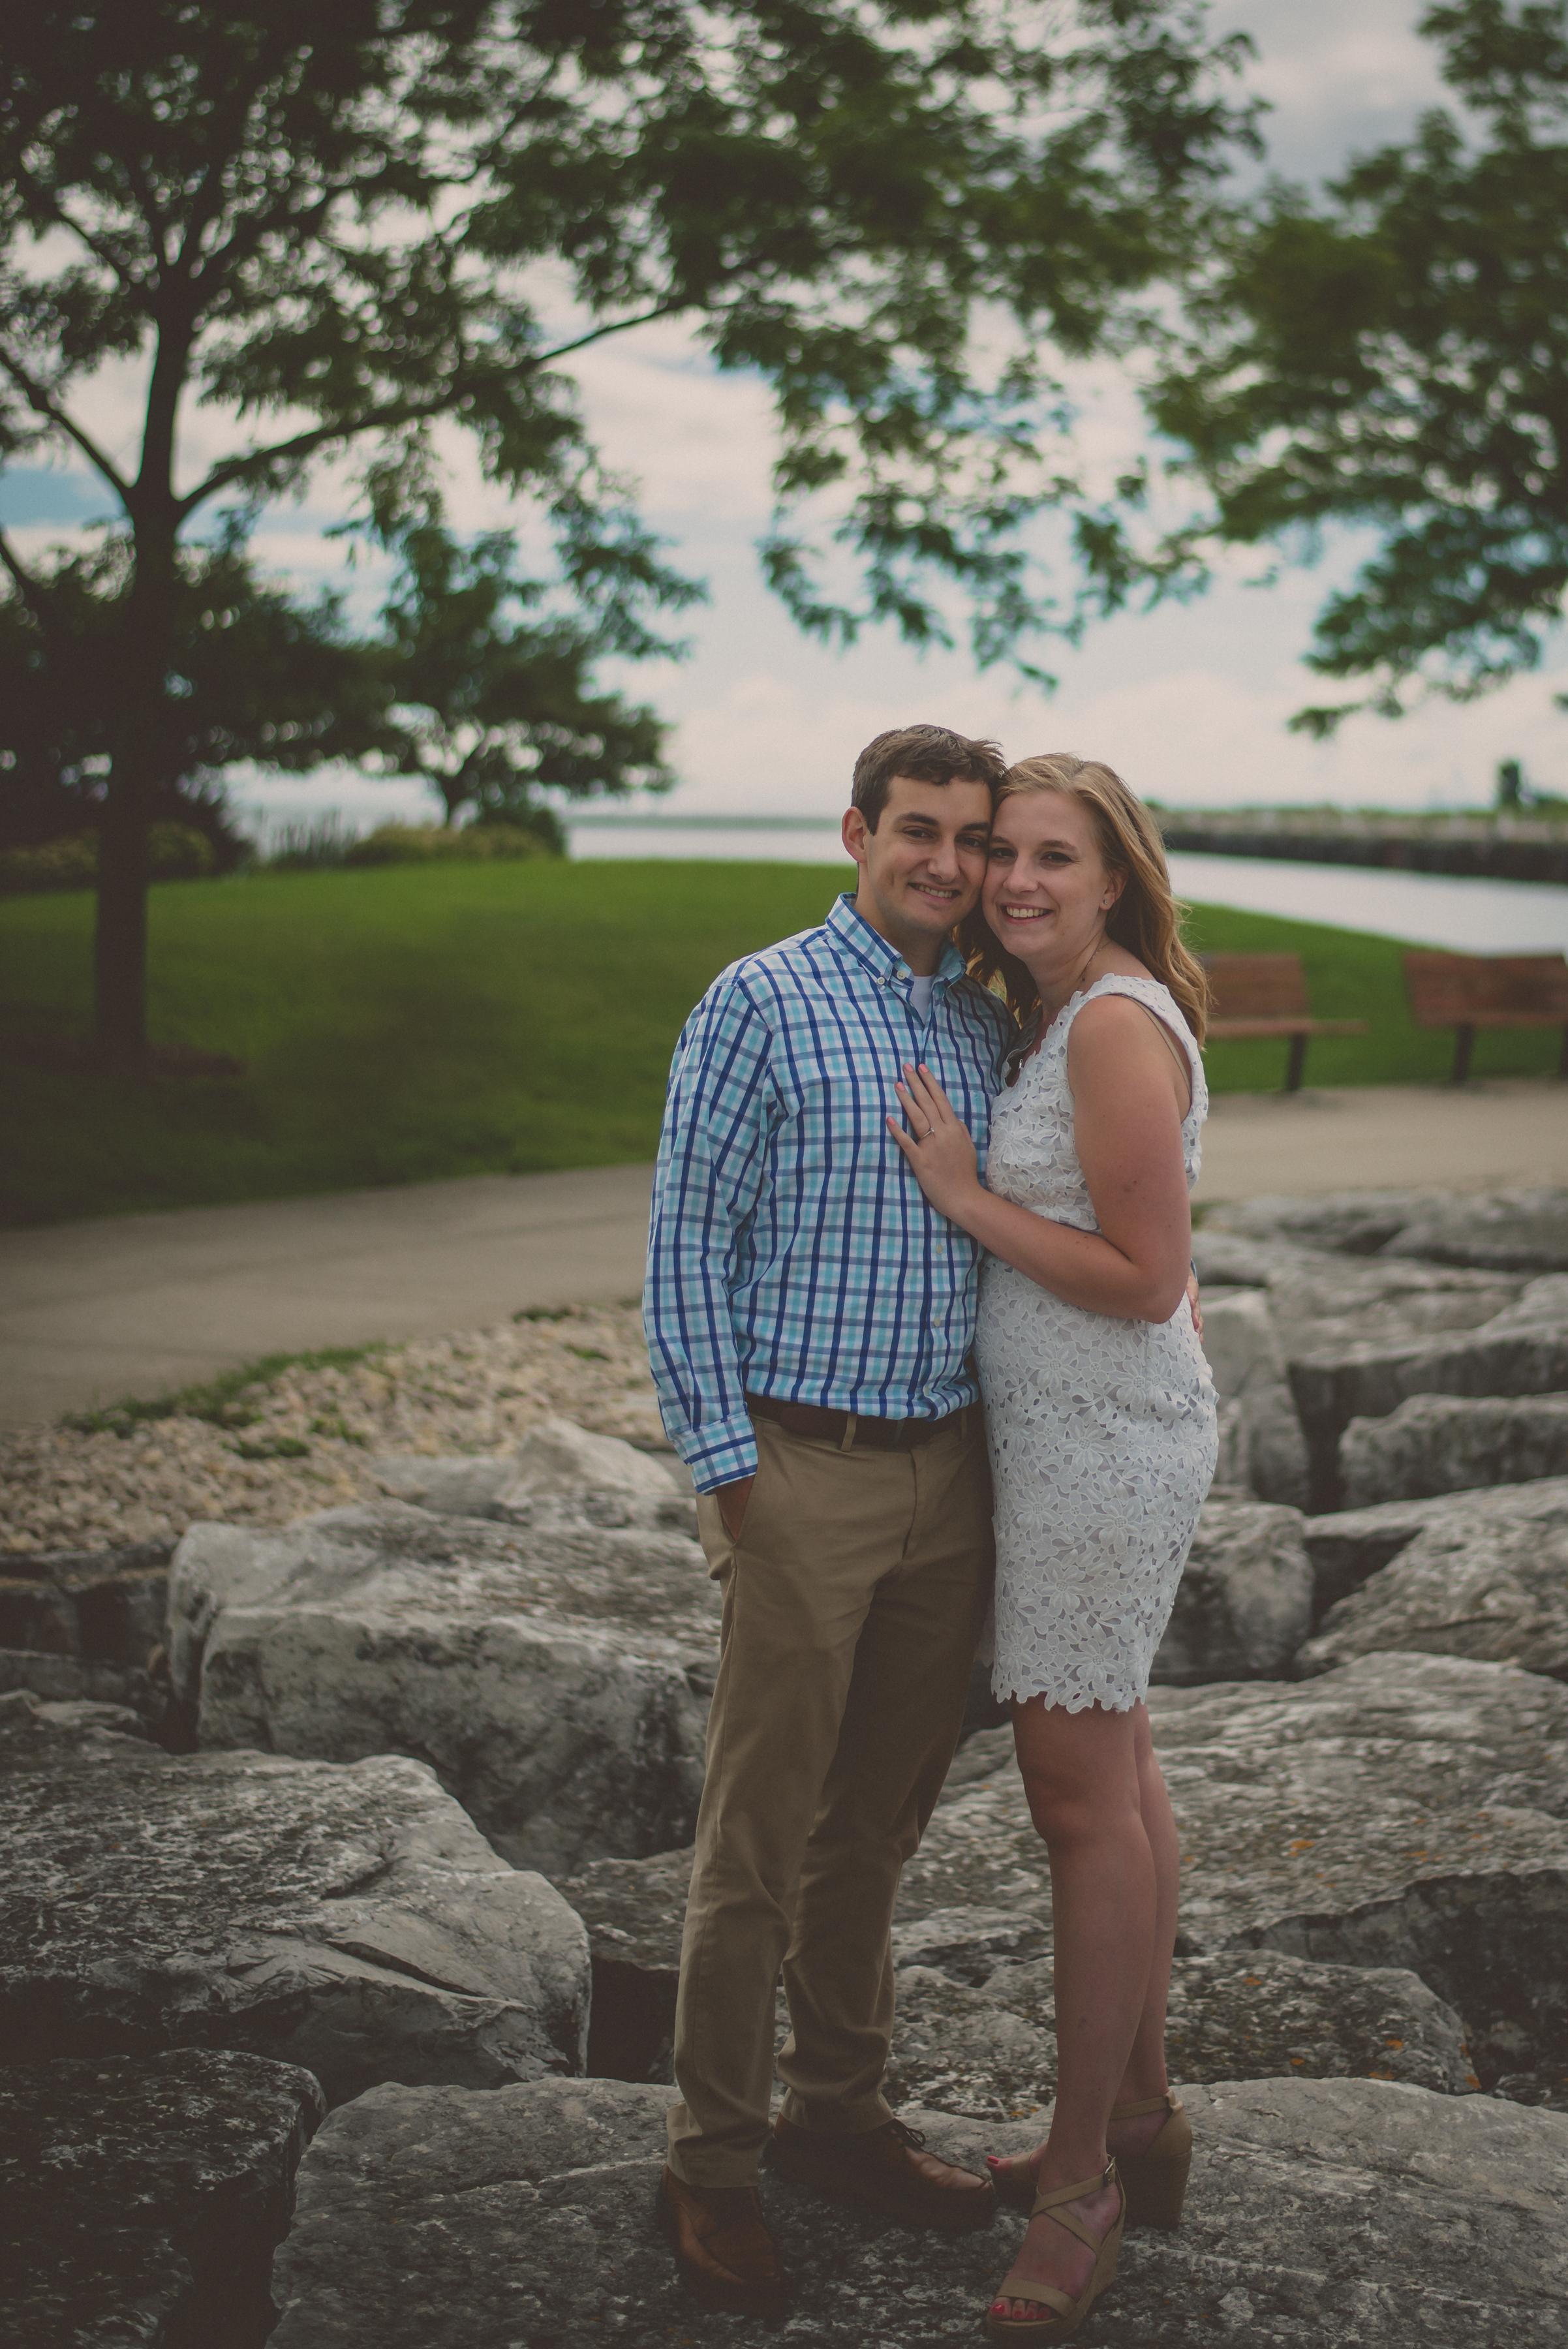 Engagement Photos #BeineEverAfter